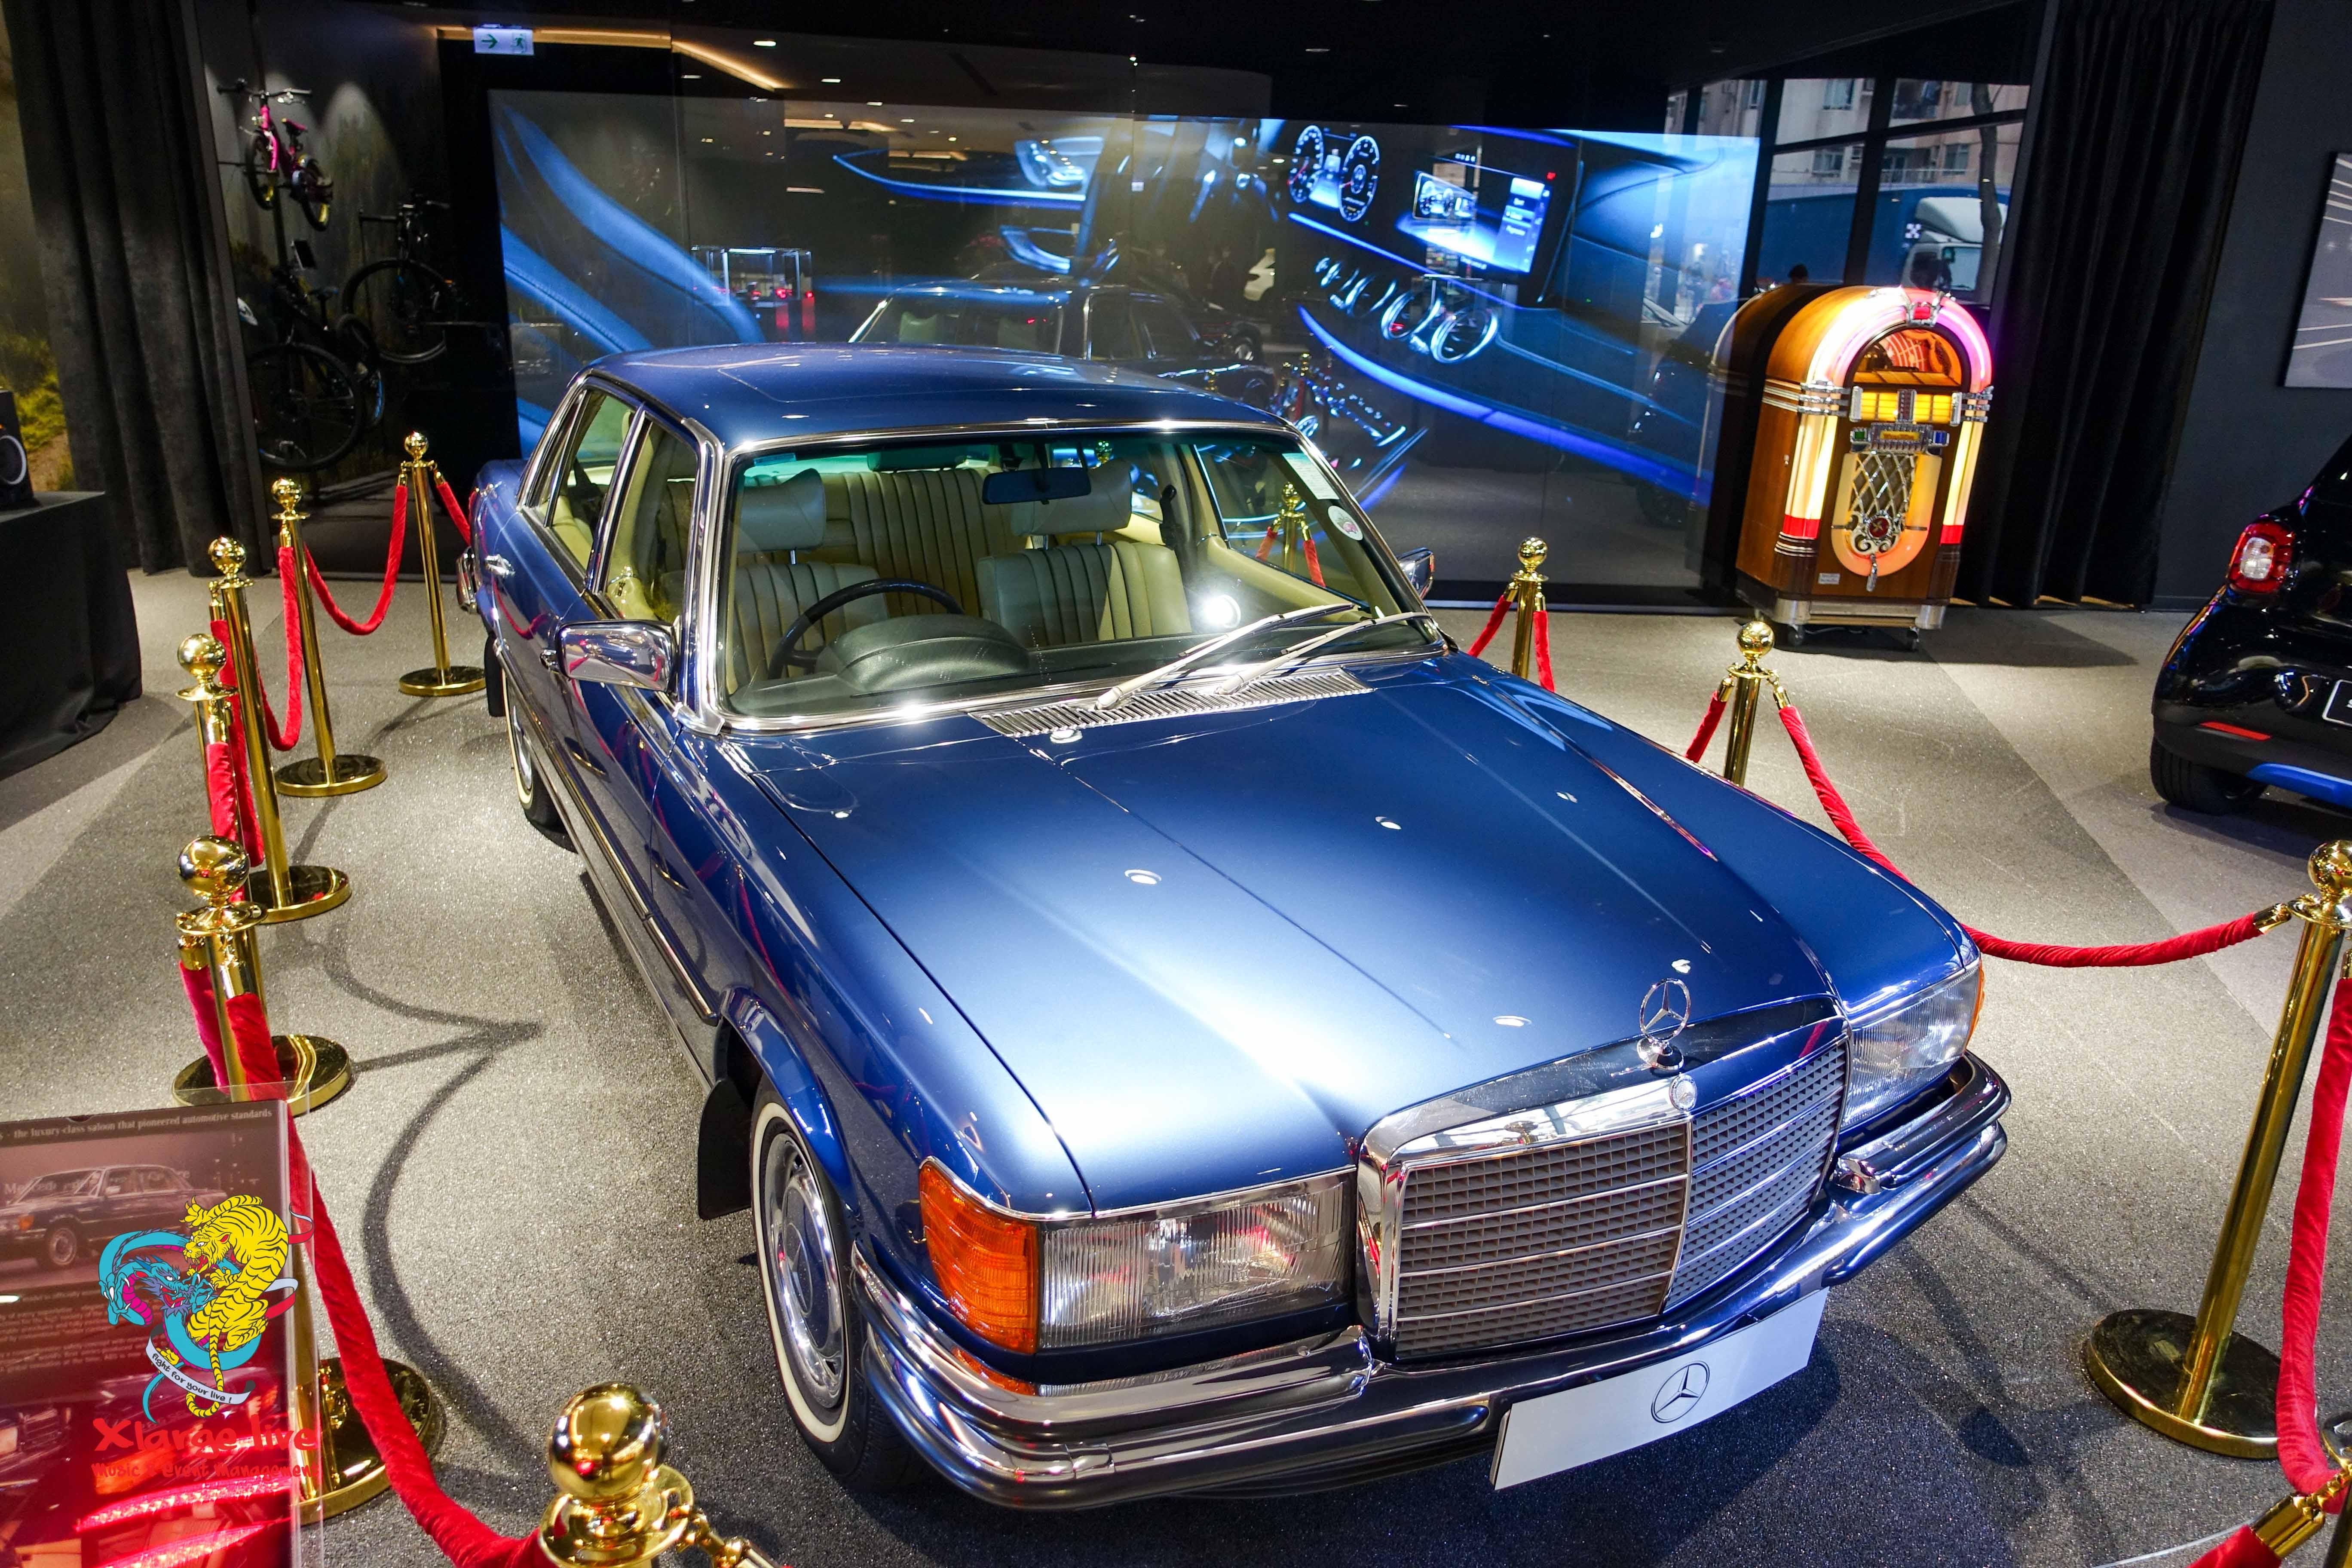 Mecedes Benz classic car showcase